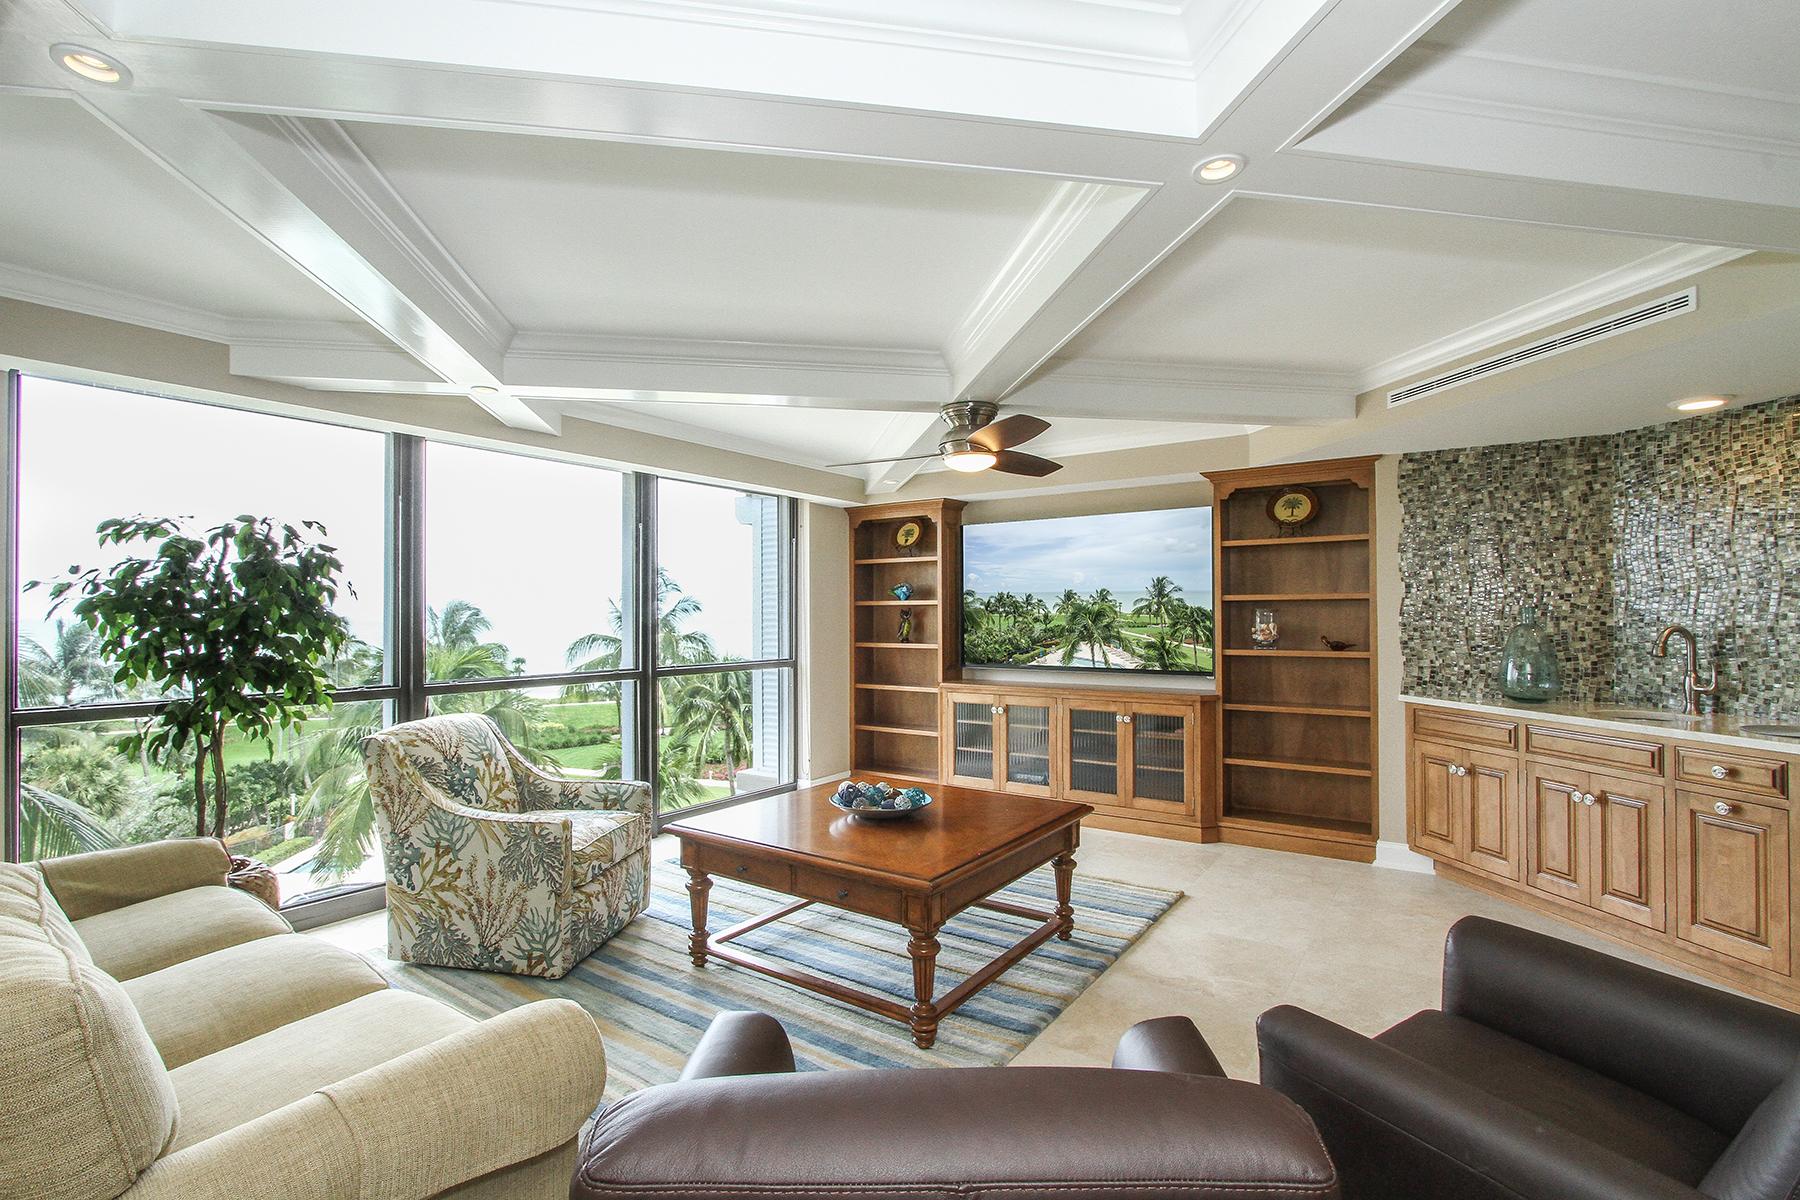 Condominium for Rent at PARK SHORE - MONACO BEACH CLUB 4401 Gulf Shore Blvd N B-503 Naples, Florida 34103 United States